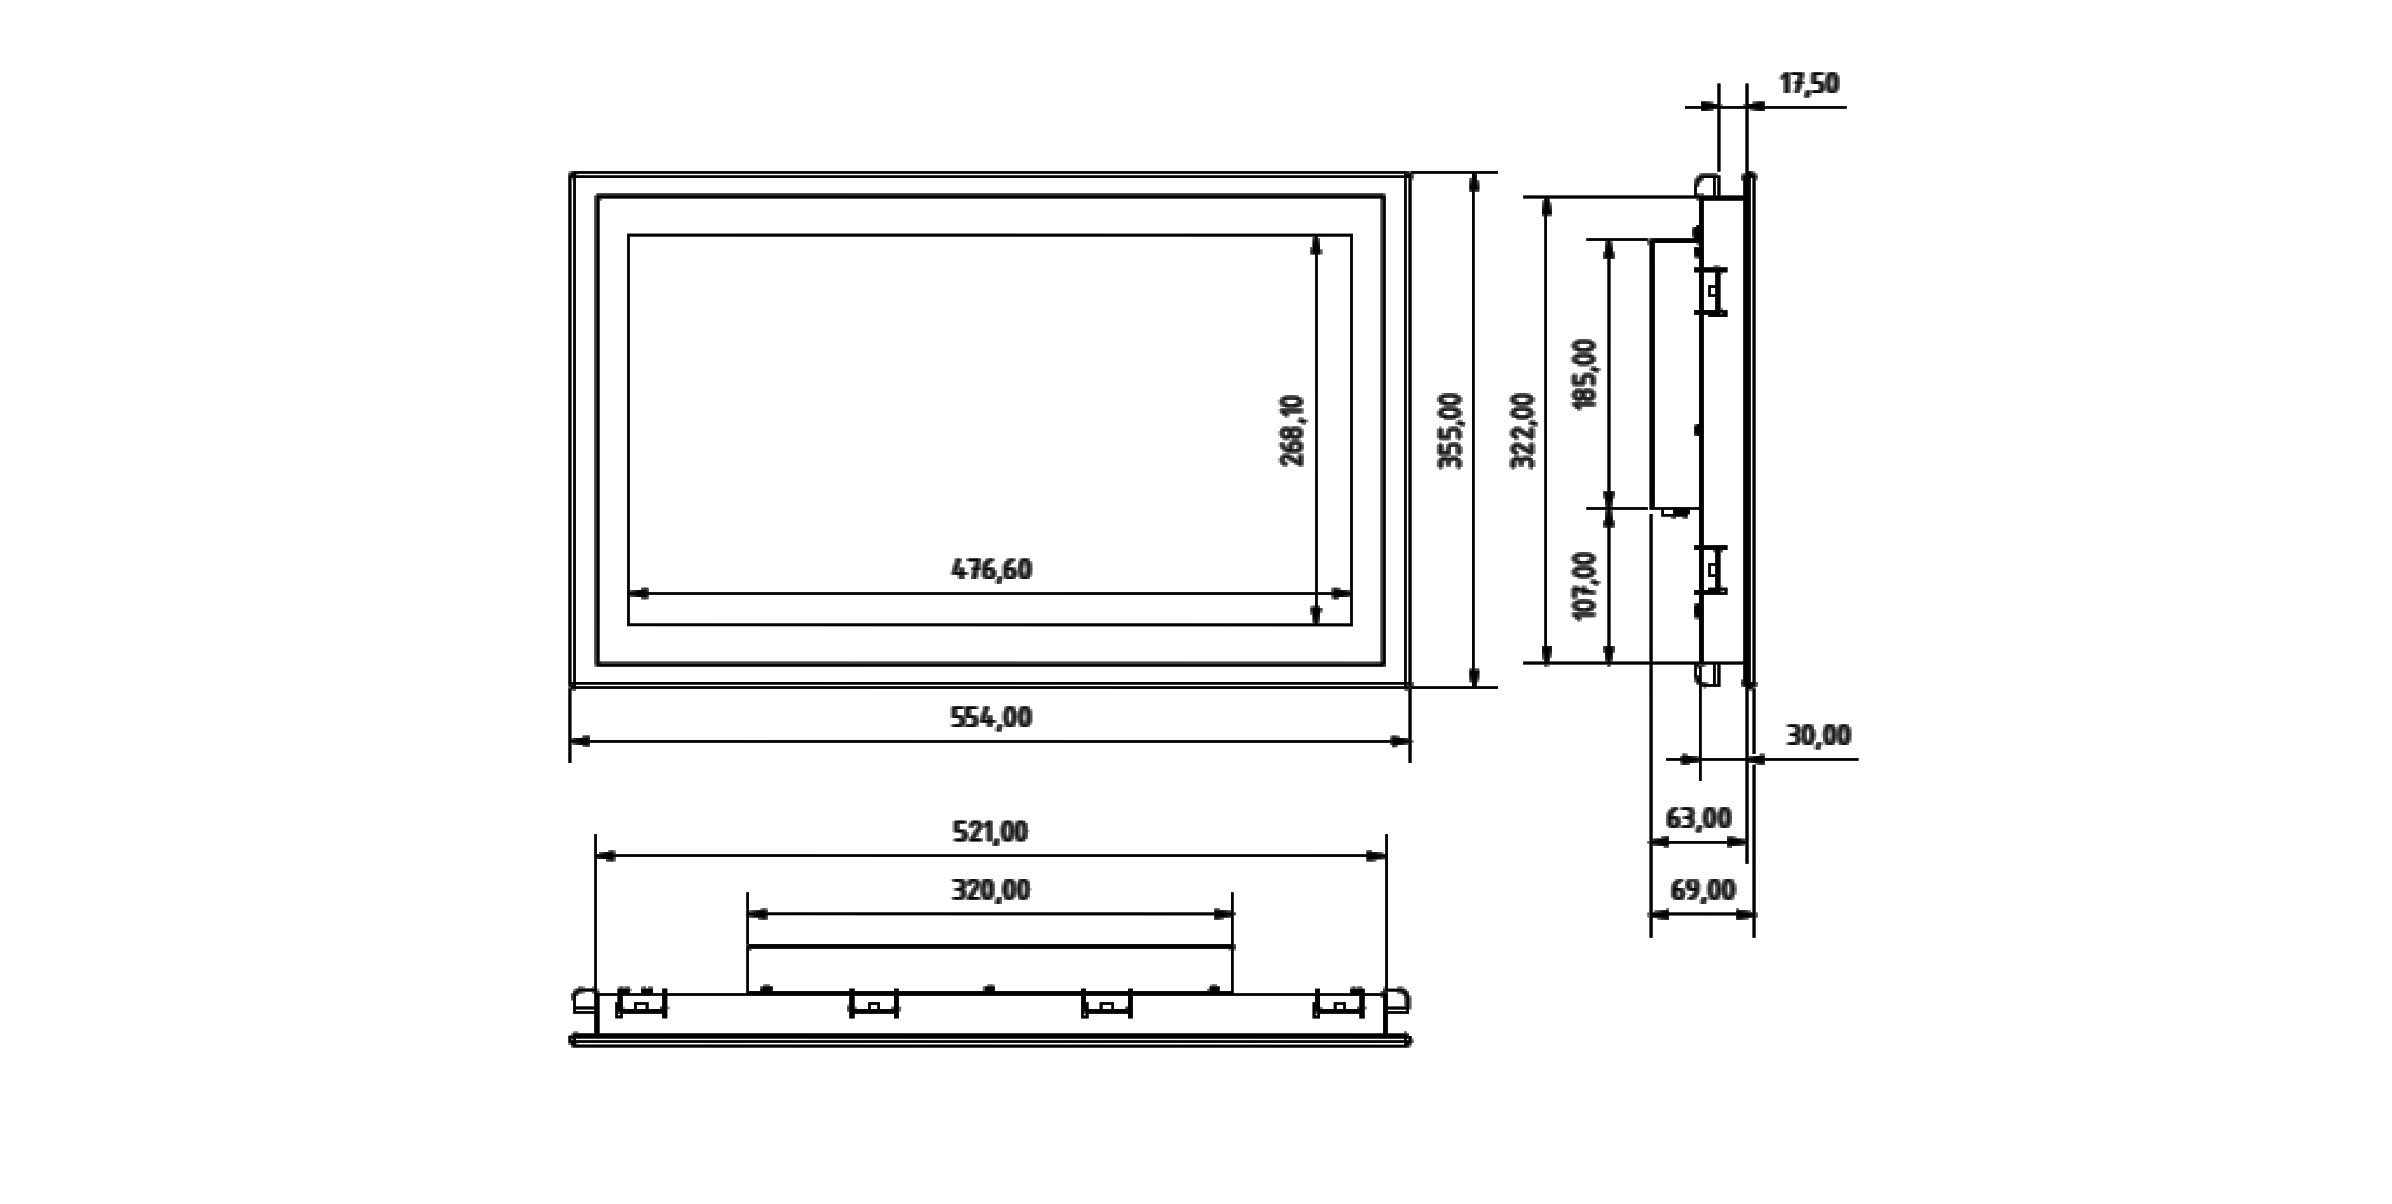 SCM-215 Einbau-Industrie-Monitor mit Touchscreen (Skizze)